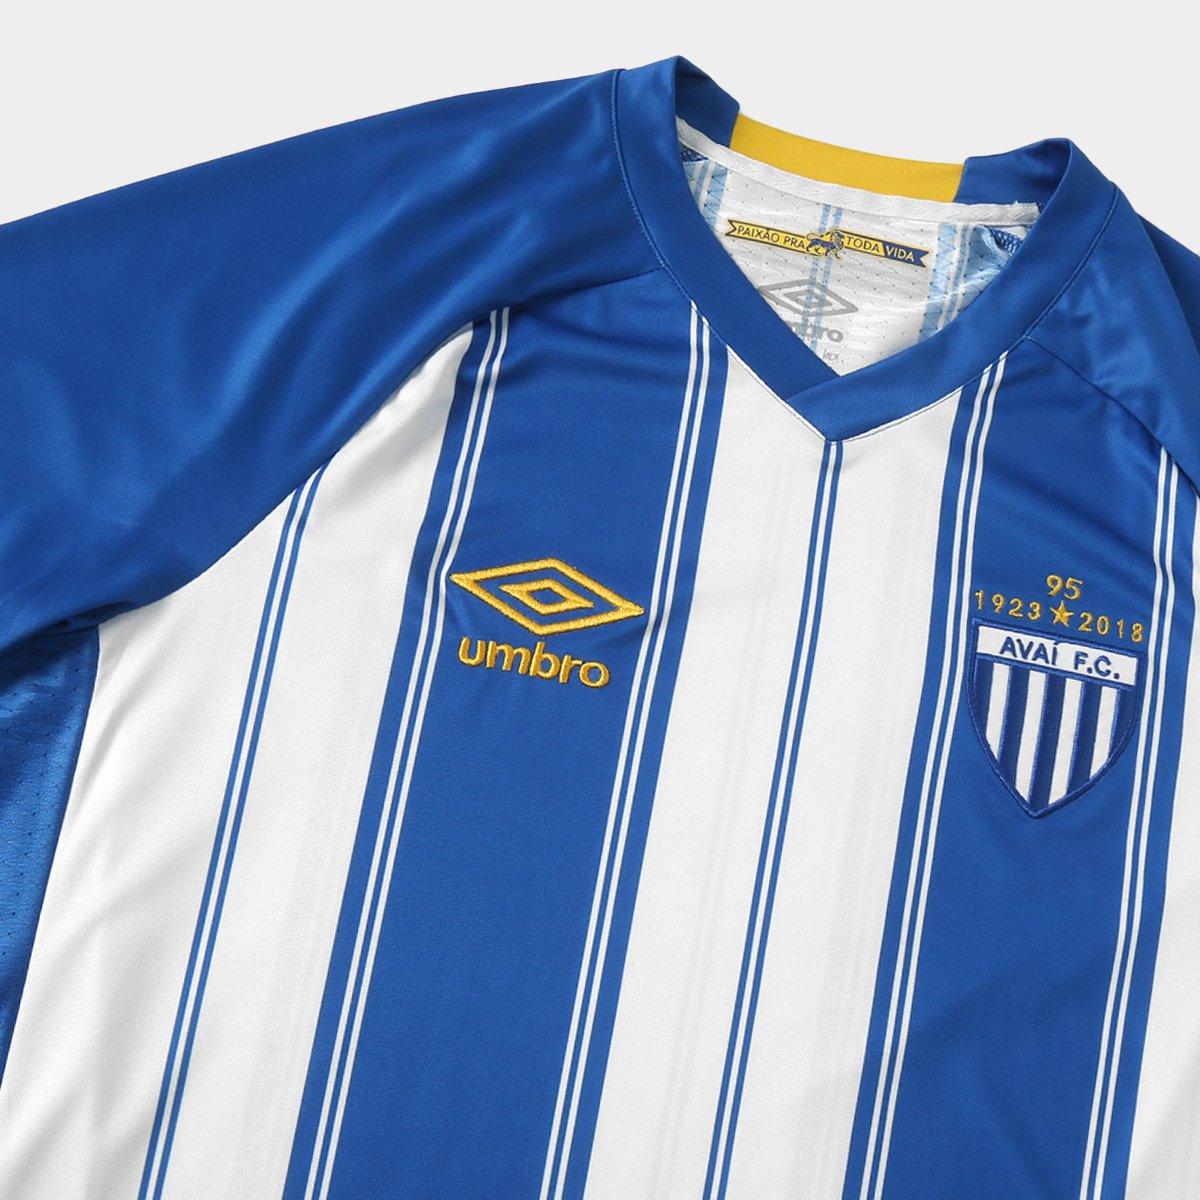 be4a995c46 Camisa Avaí I 18 19 s n° Torcedor Umbro Masculino - Azul e Branco ...